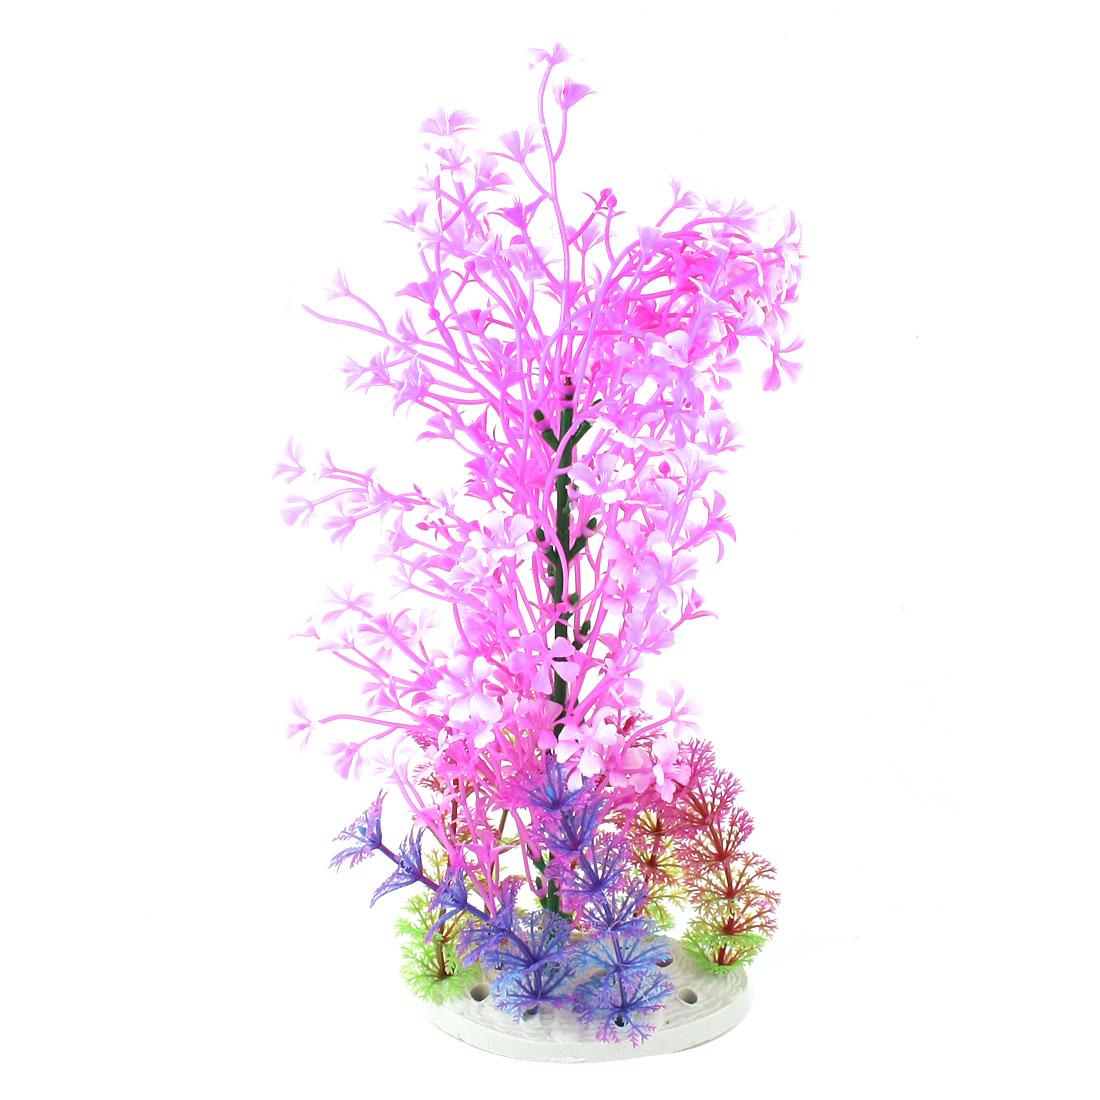 "Aquarium Underwater Landscaping Emulational Purple Plastic Flower Grass Plant Decor 11.4"" High"